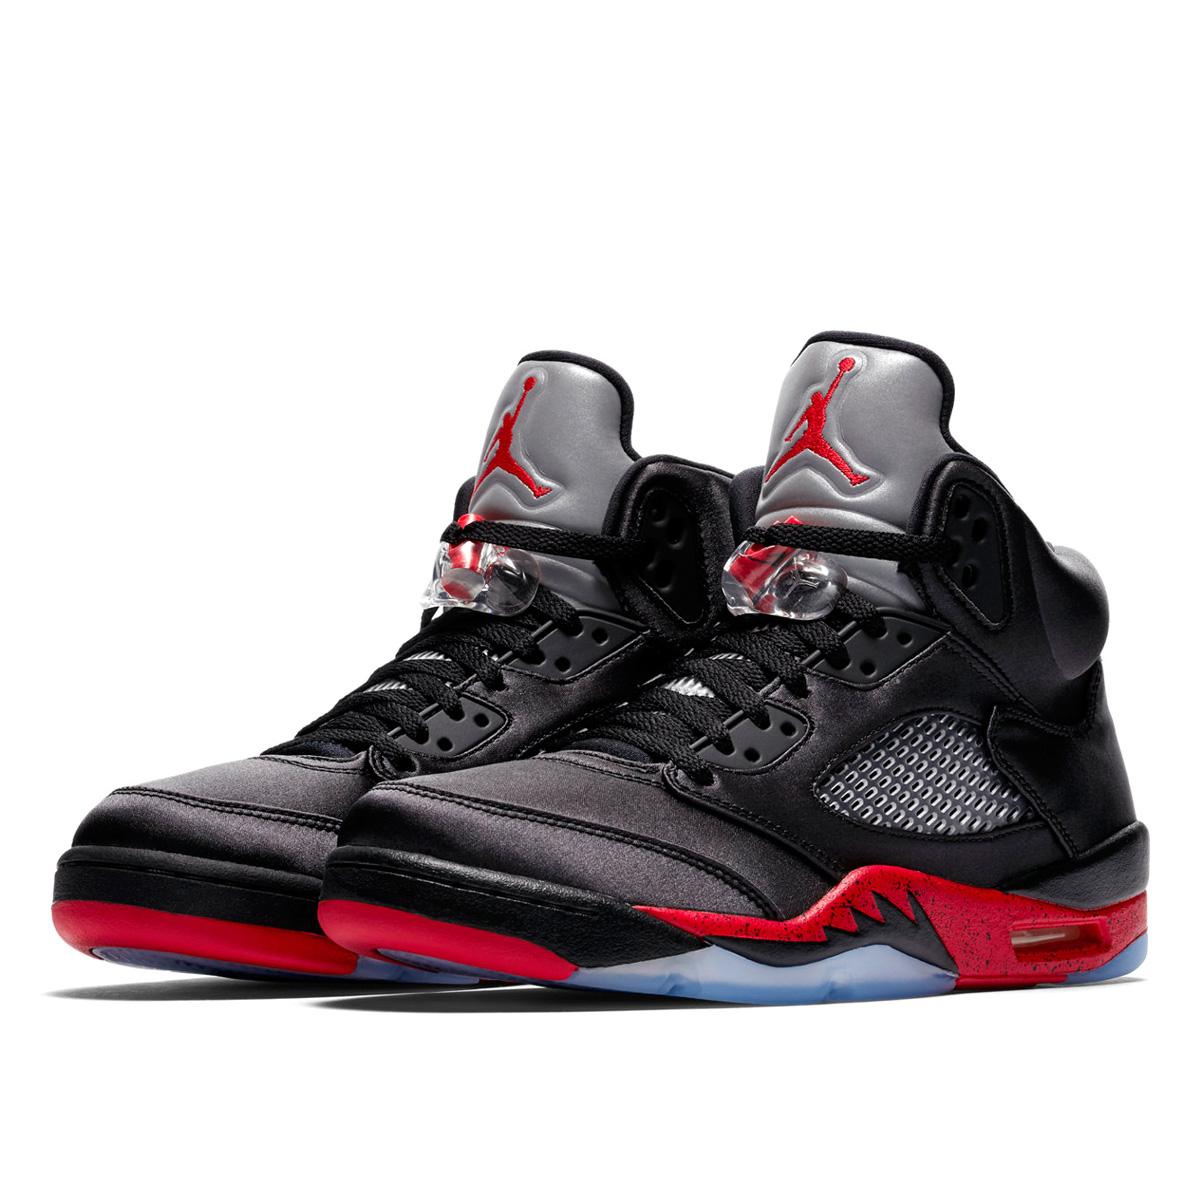 NIKE AIR JORDAN 5 RETRO Nike Air Jordan 5 nostalgic SATIN BLACKUNIVERSITY RED 136,027 006